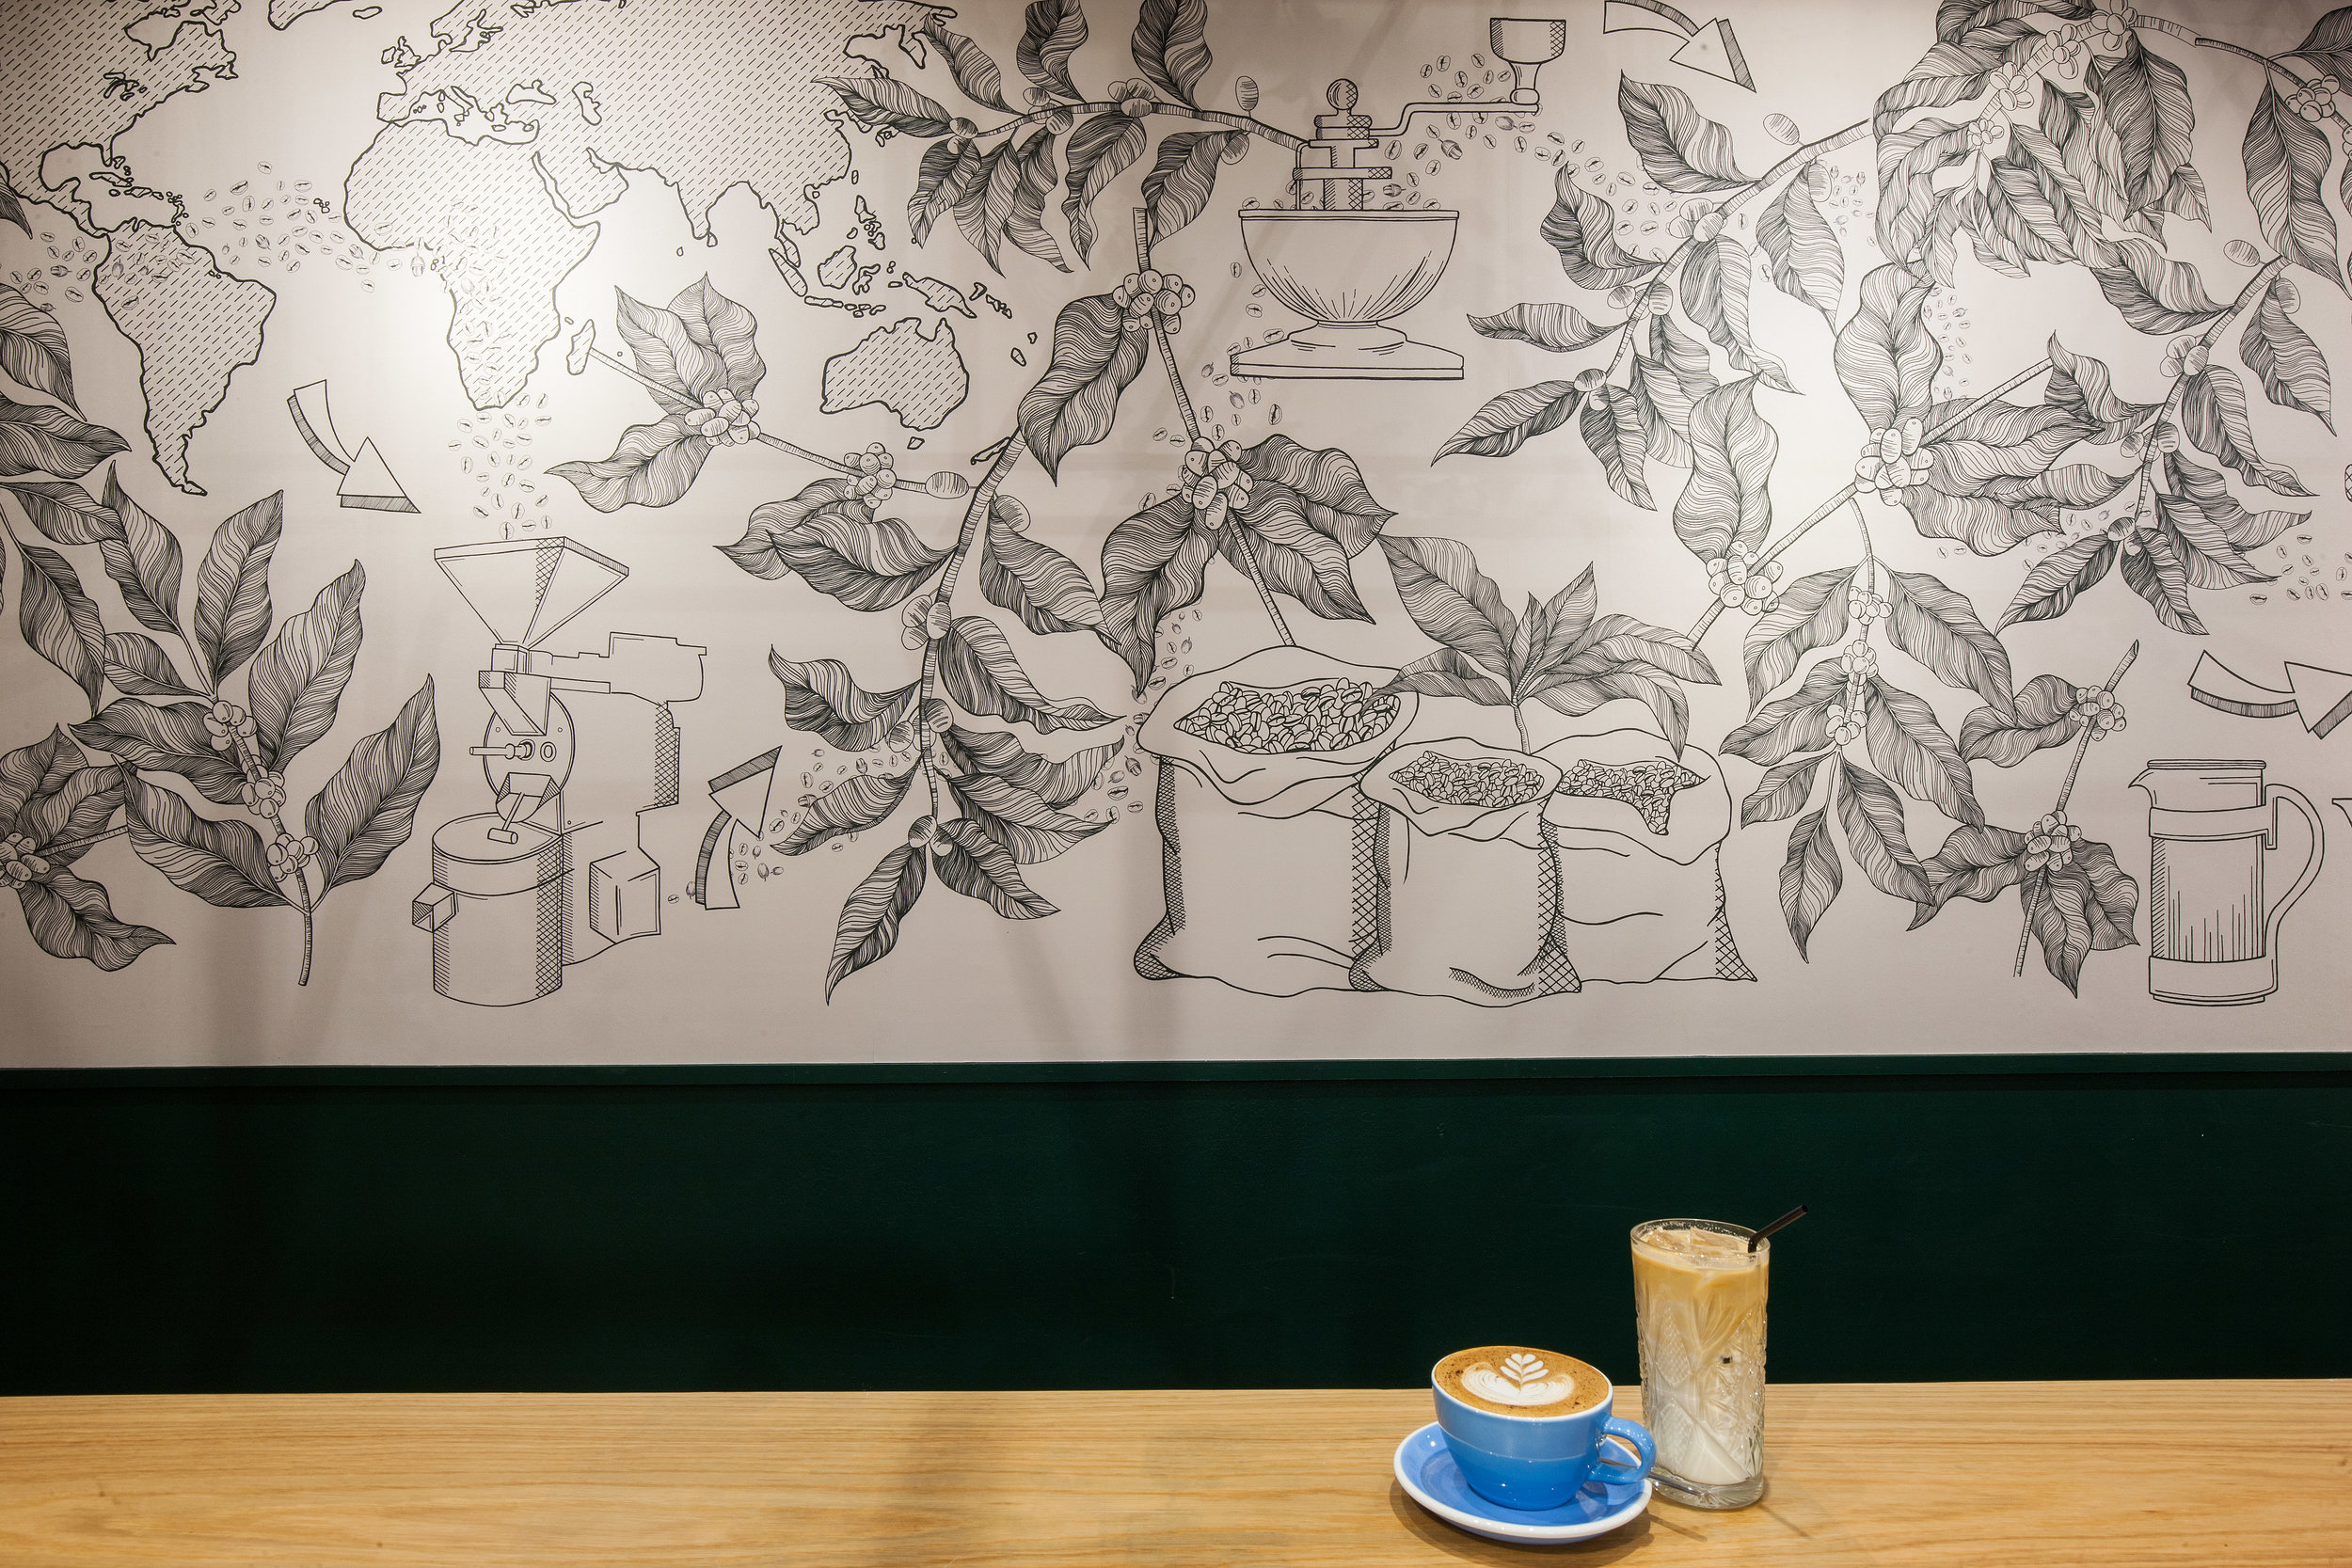 BEAR Derby wall art